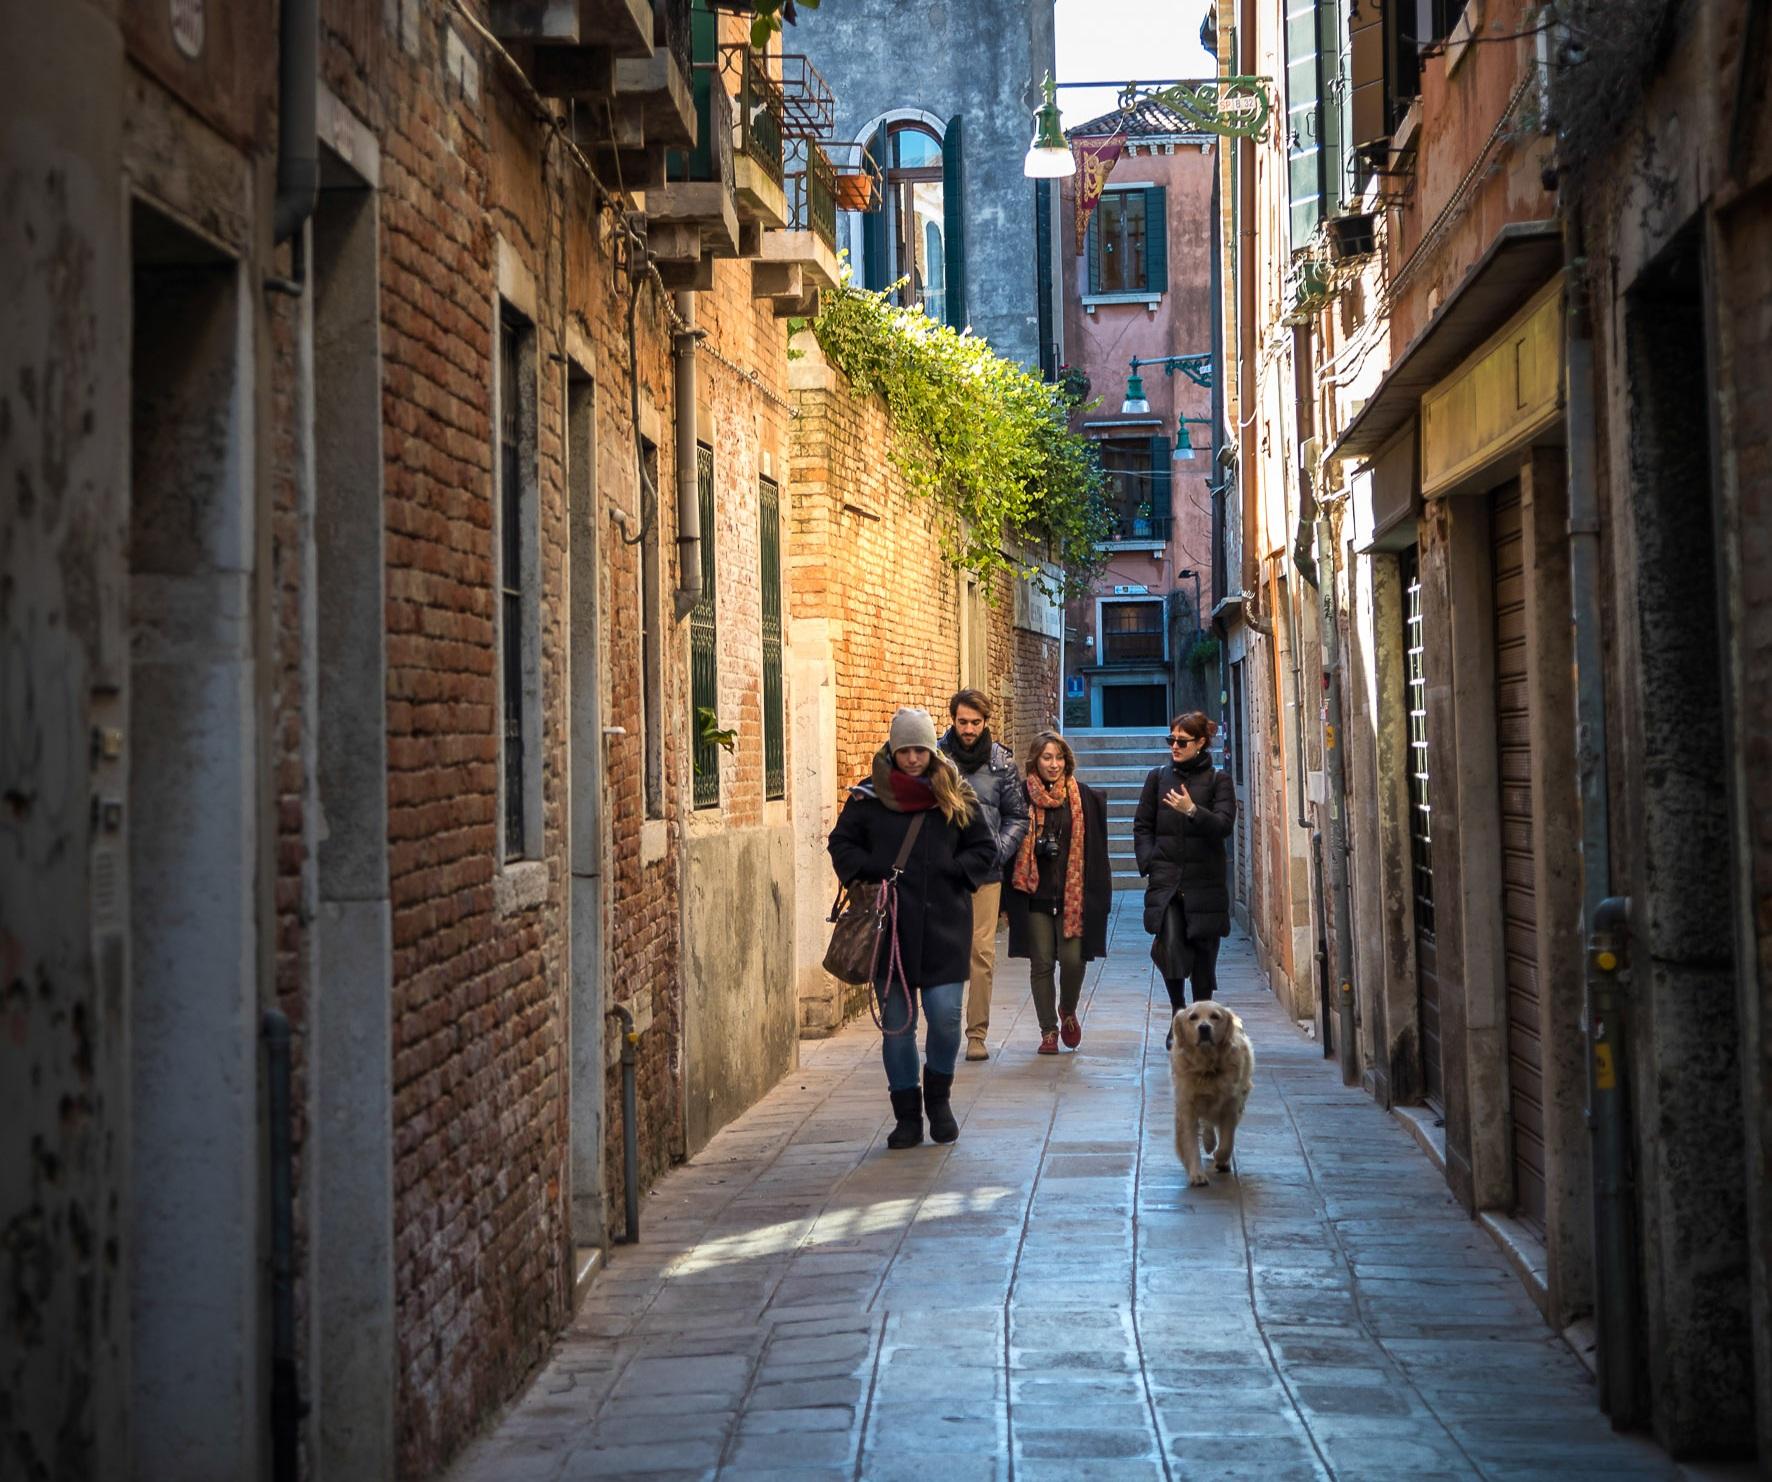 Travelers inside Venice lanes